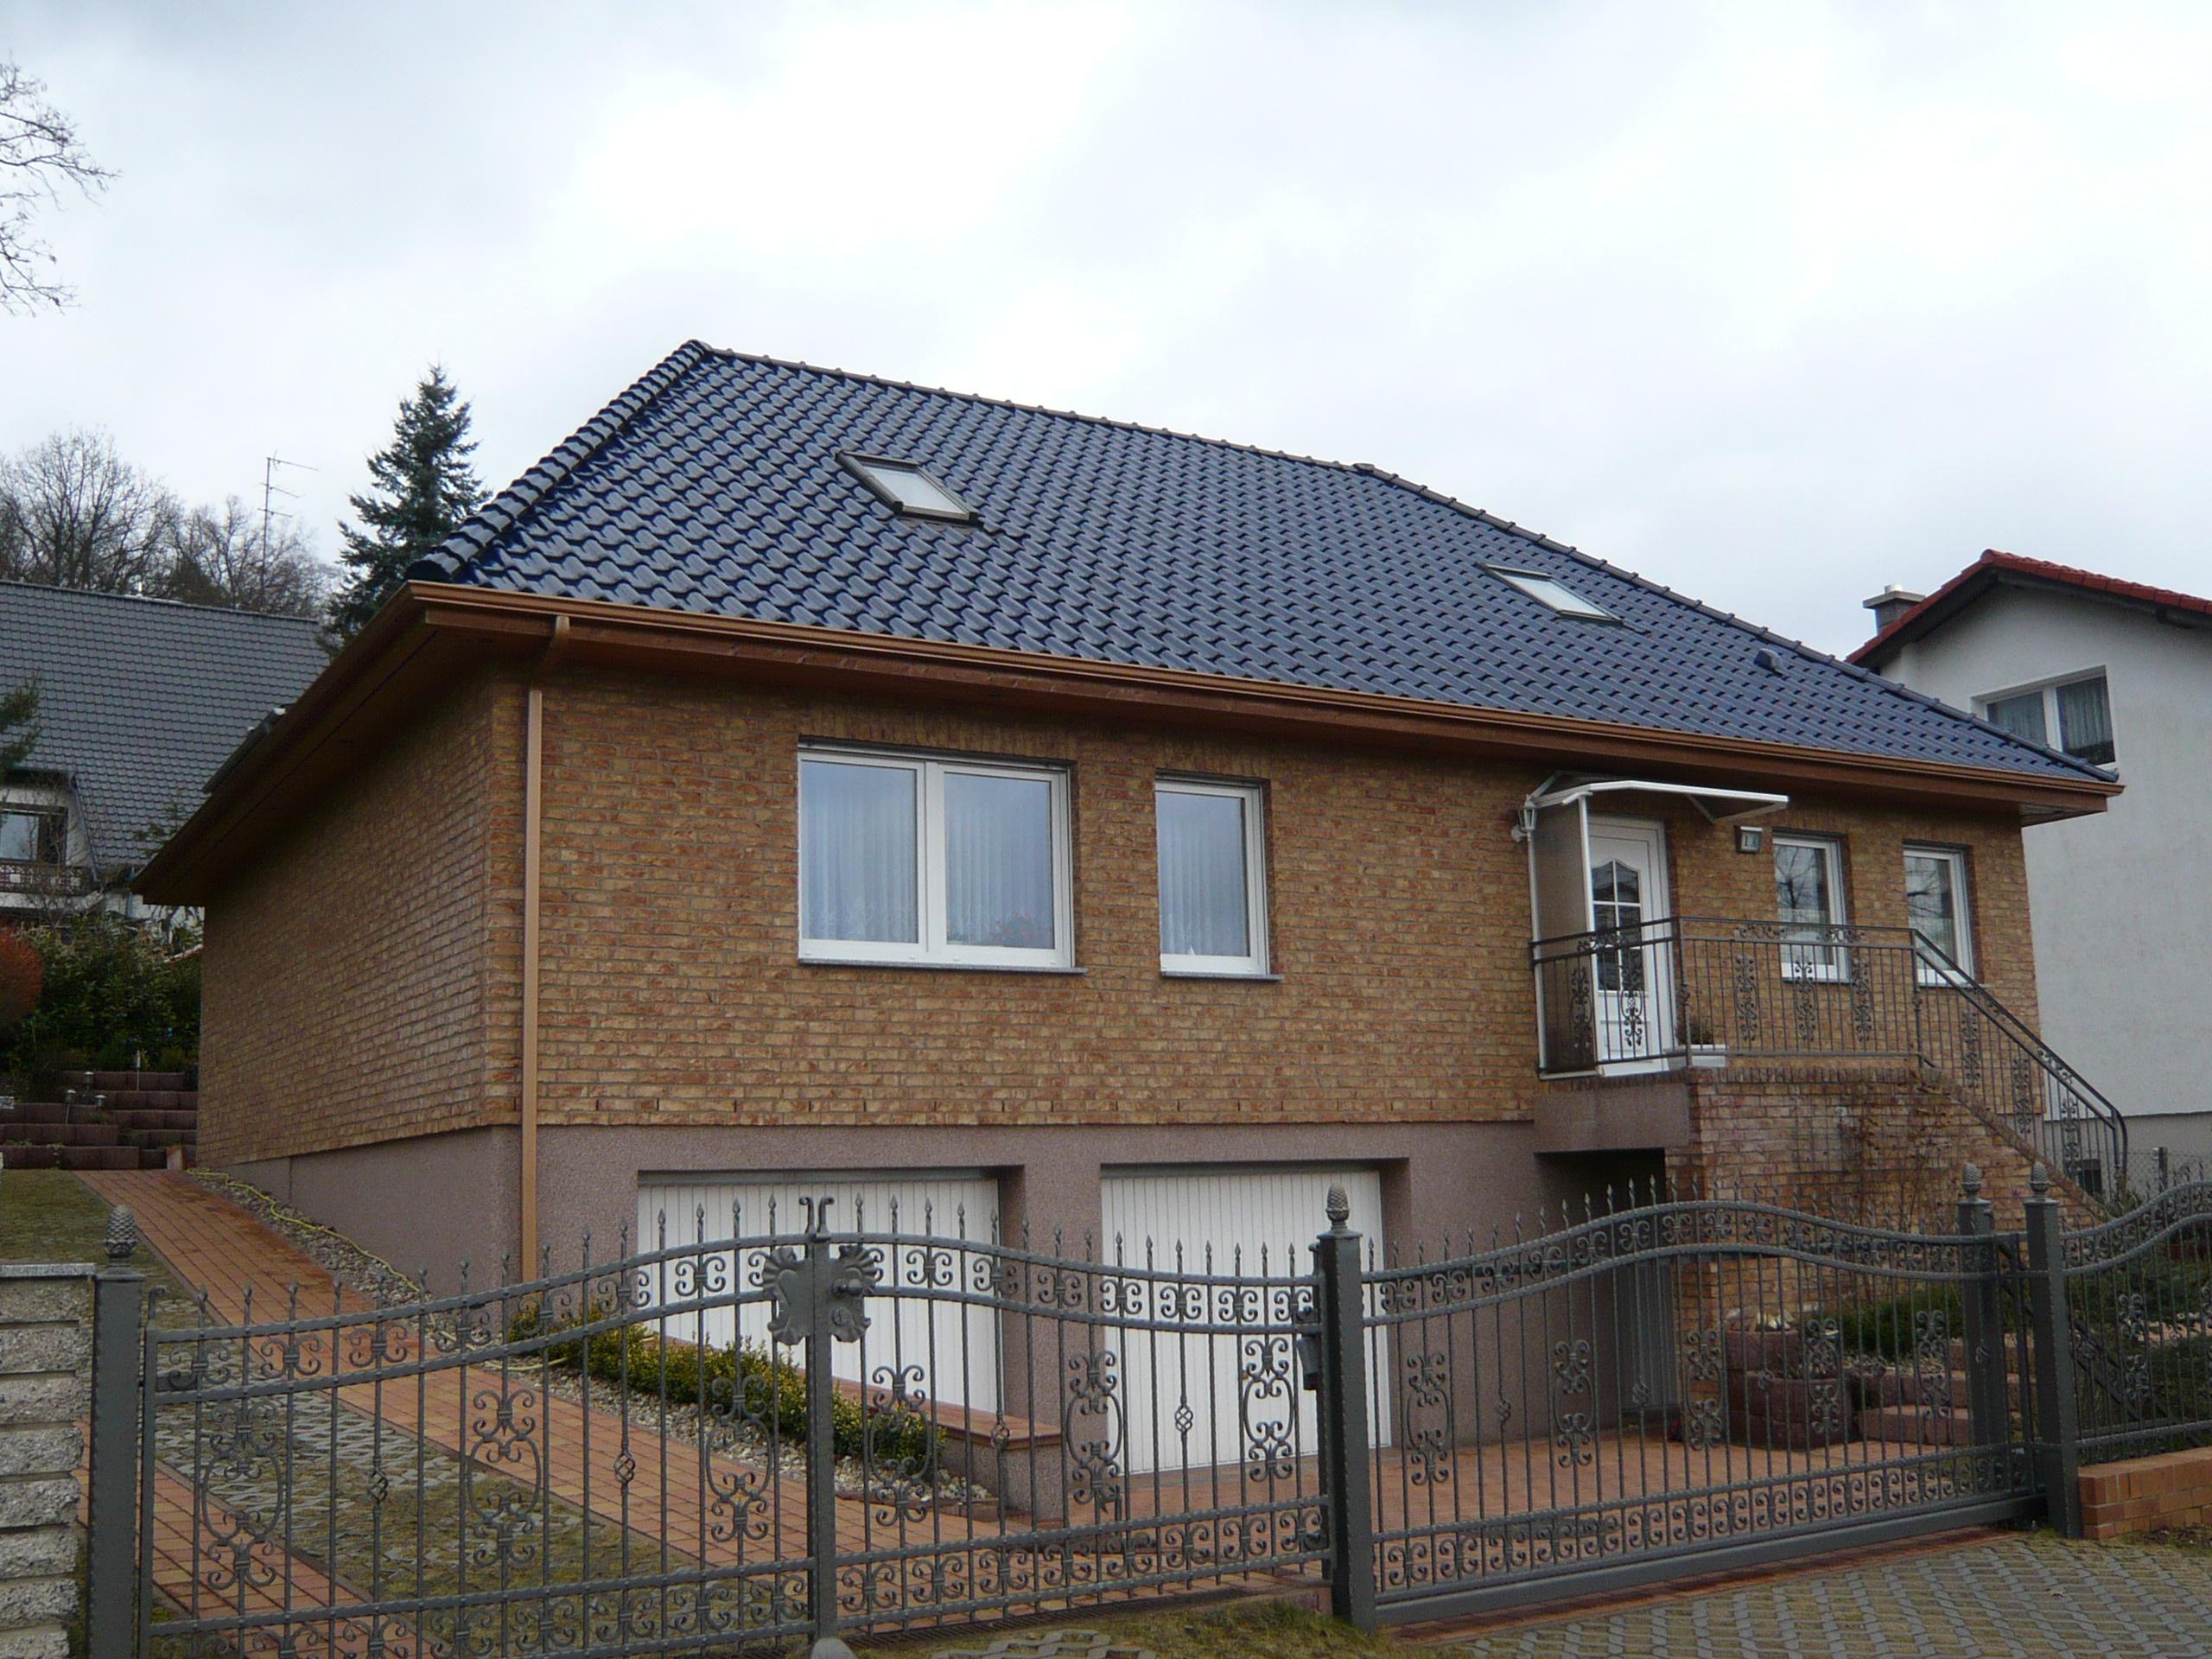 Falkensee bungalow lipsia haus leipzig for Bungalow falkensee